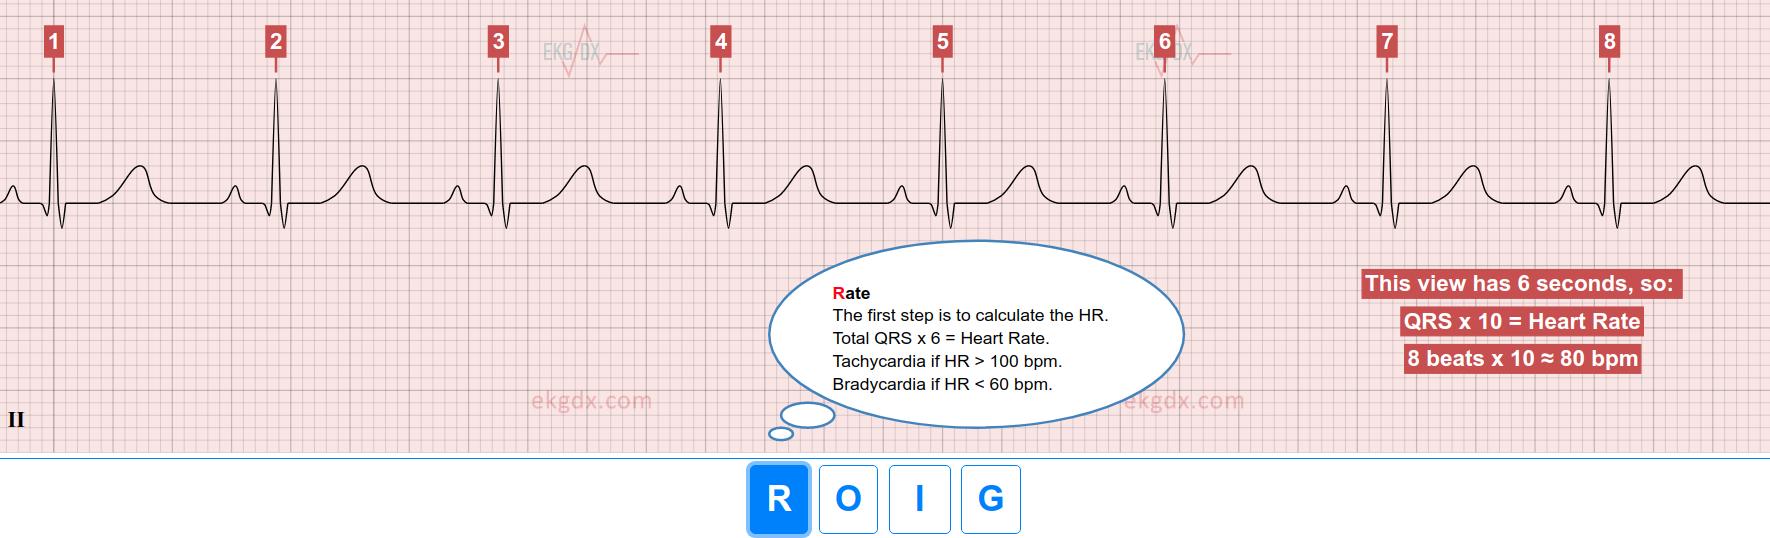 EKG rate